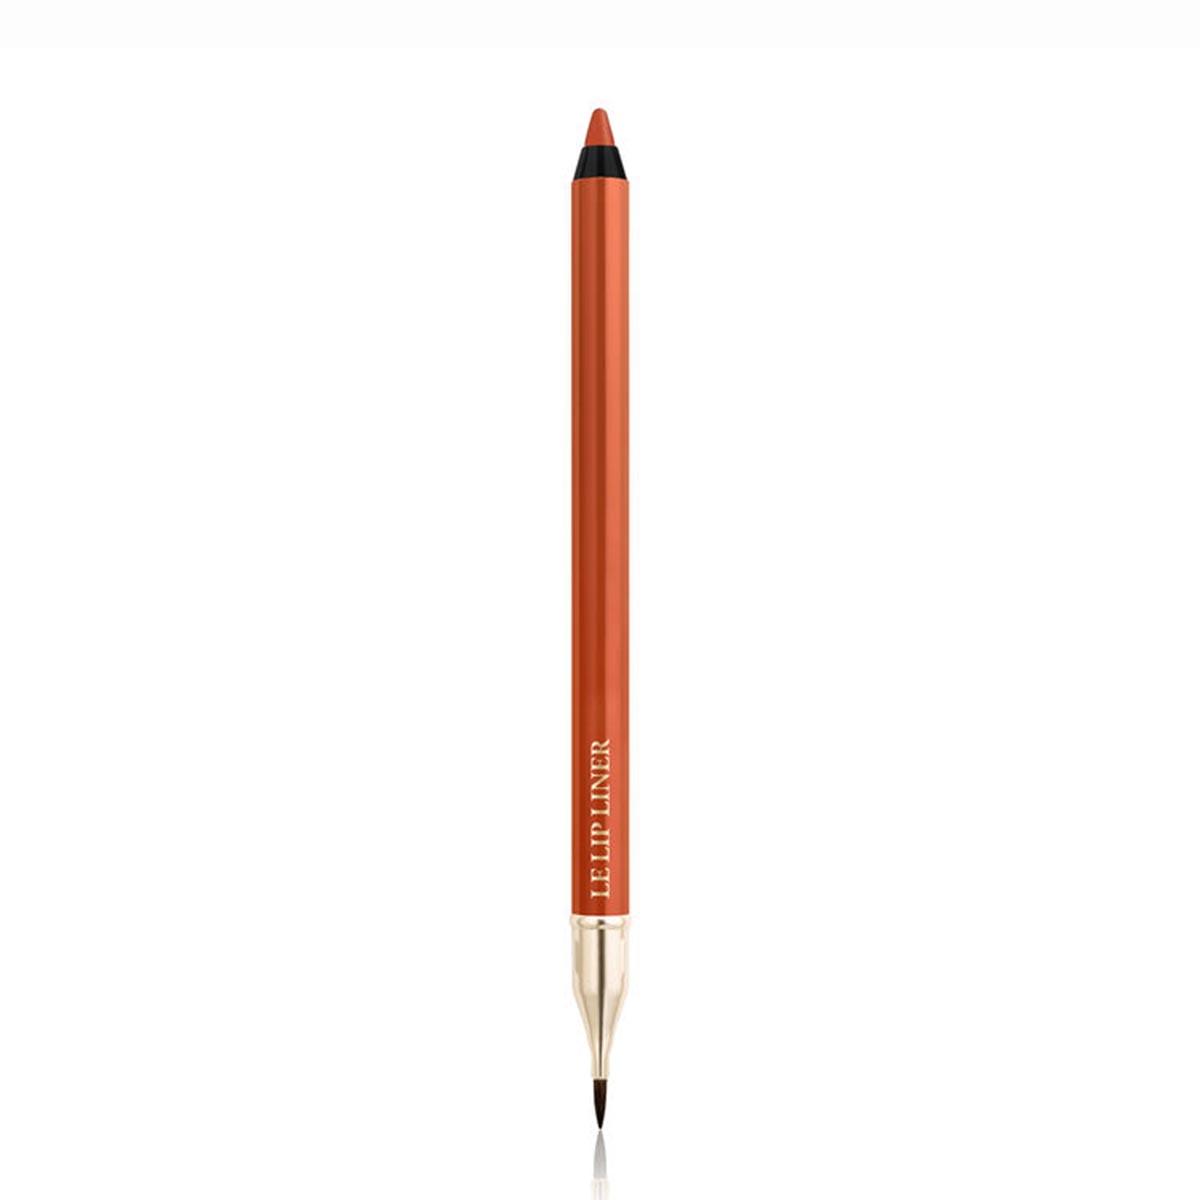 Lancome le lip liner 66 orange sacree